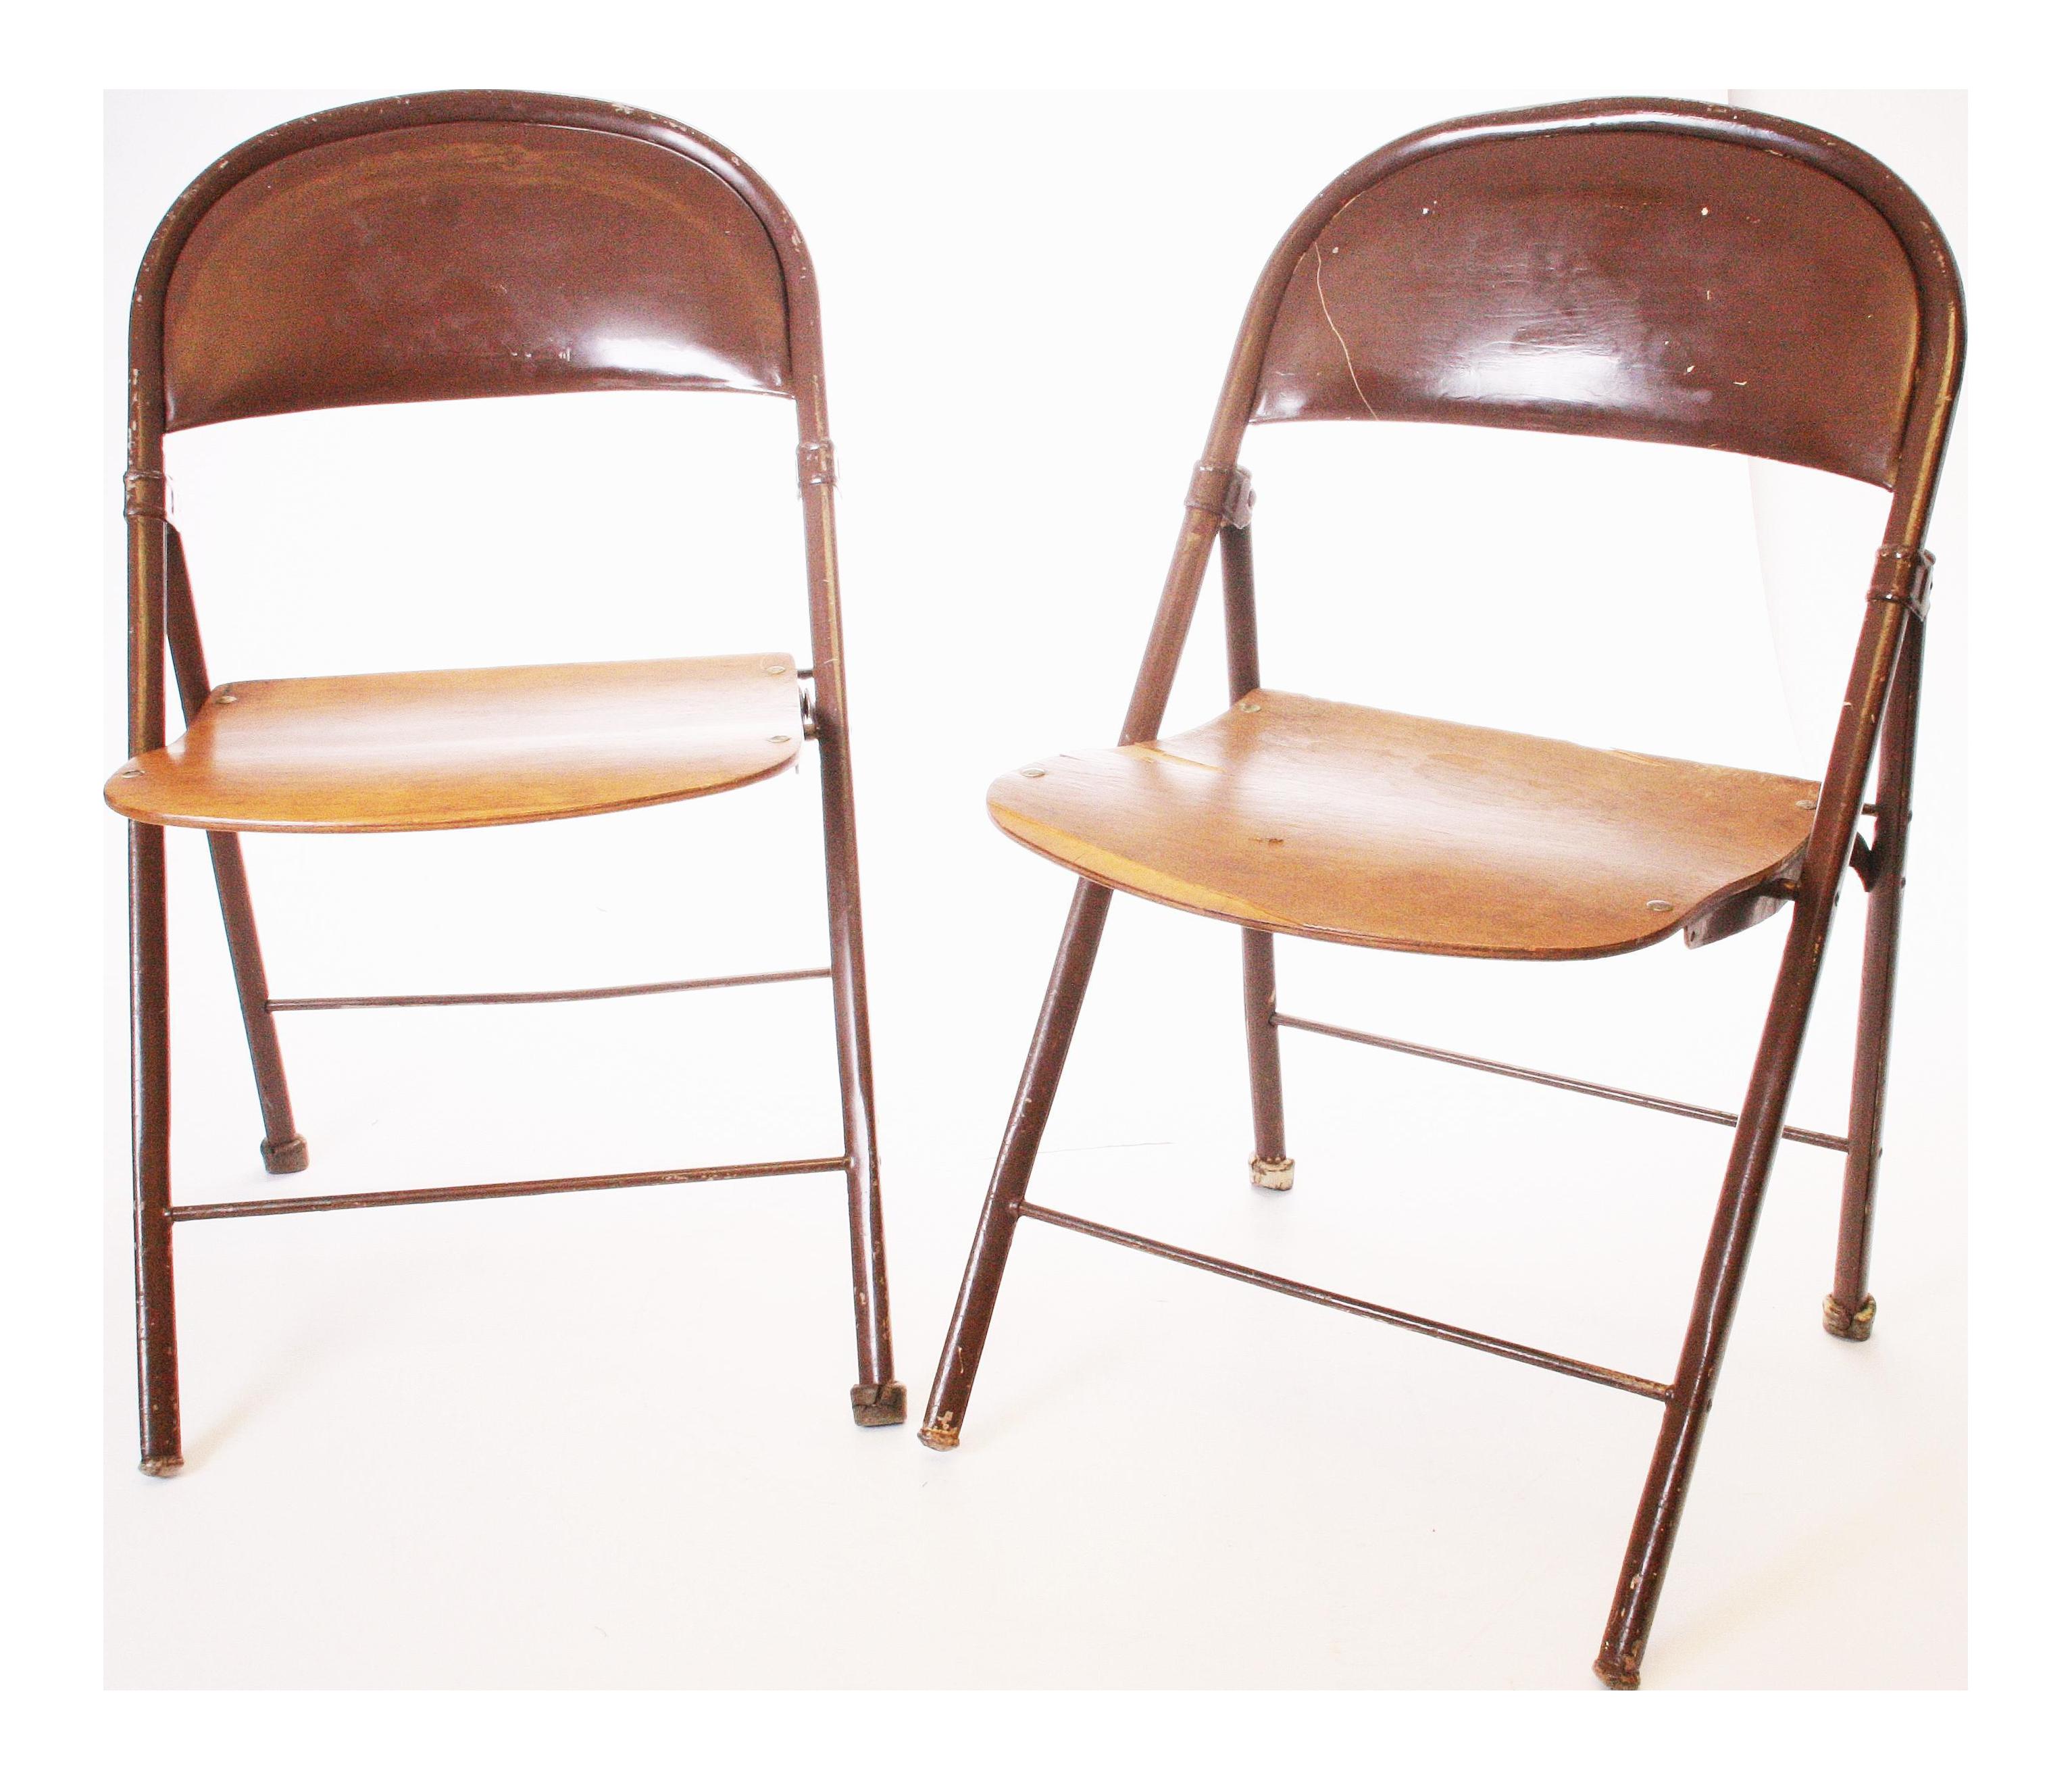 Vintage Metal U0026 Bentwood Folding Chairs   A Pair